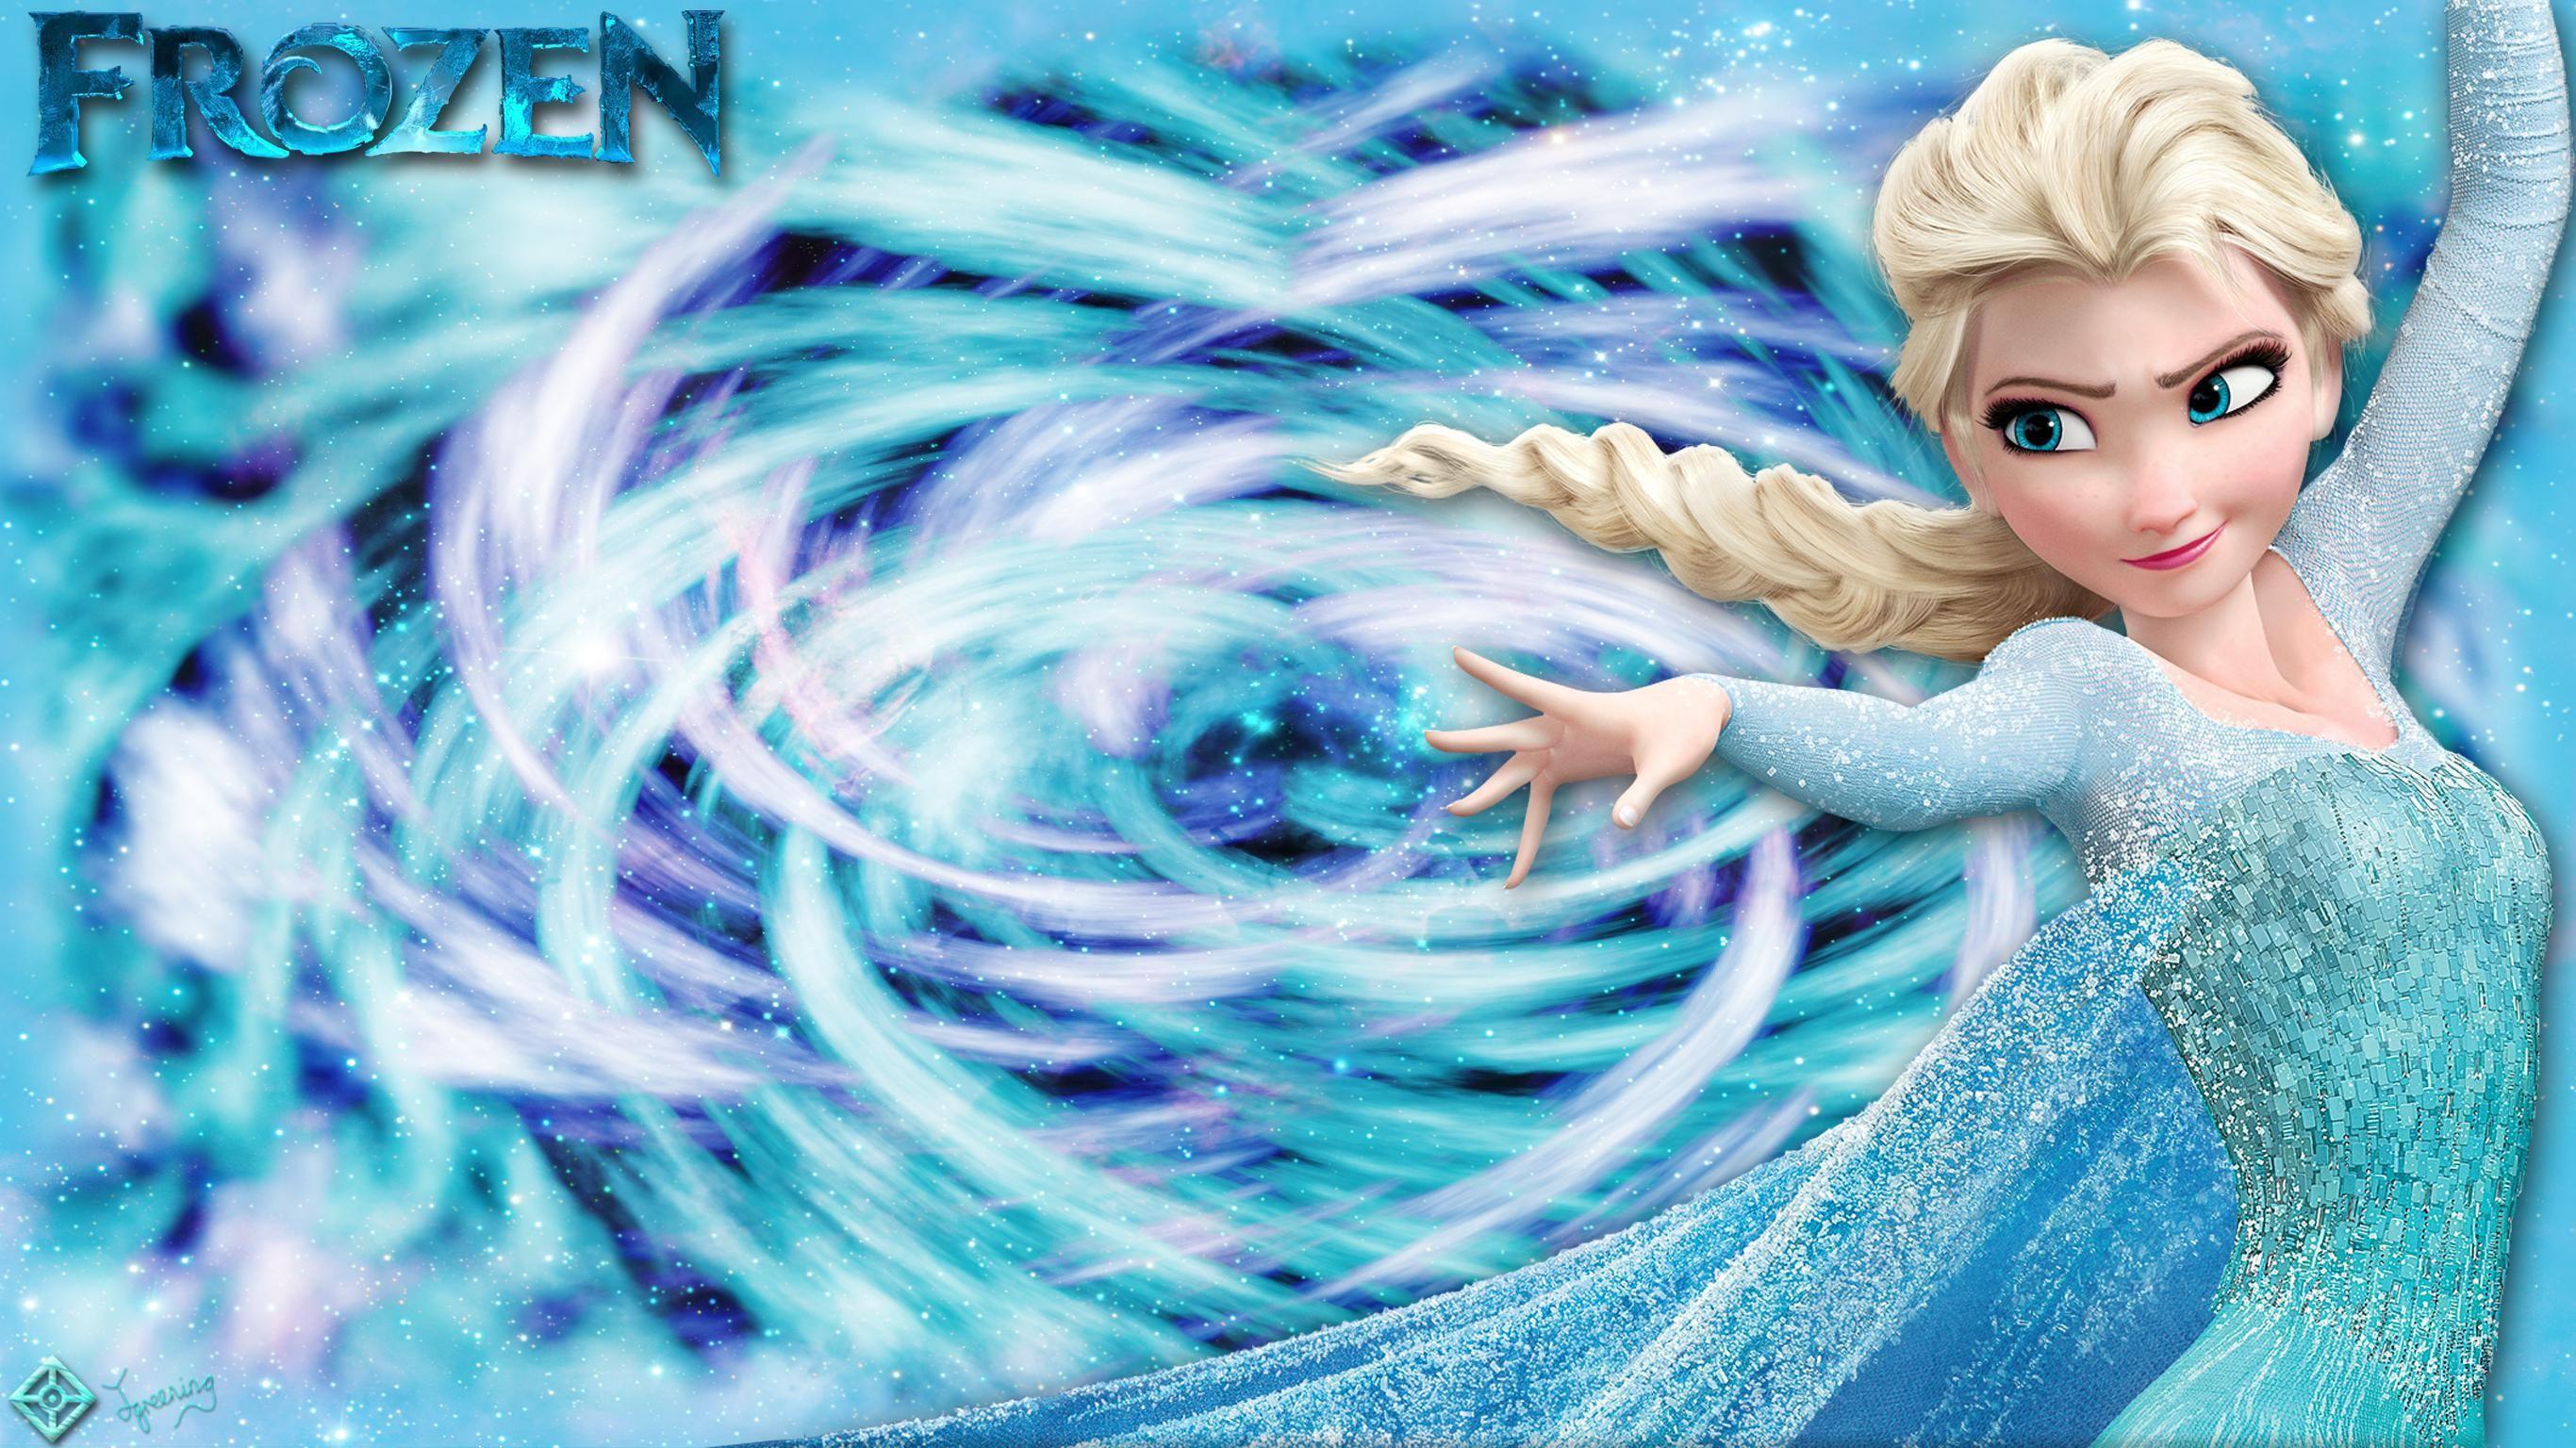 Images Of Elsa From Frozen Wallpaper